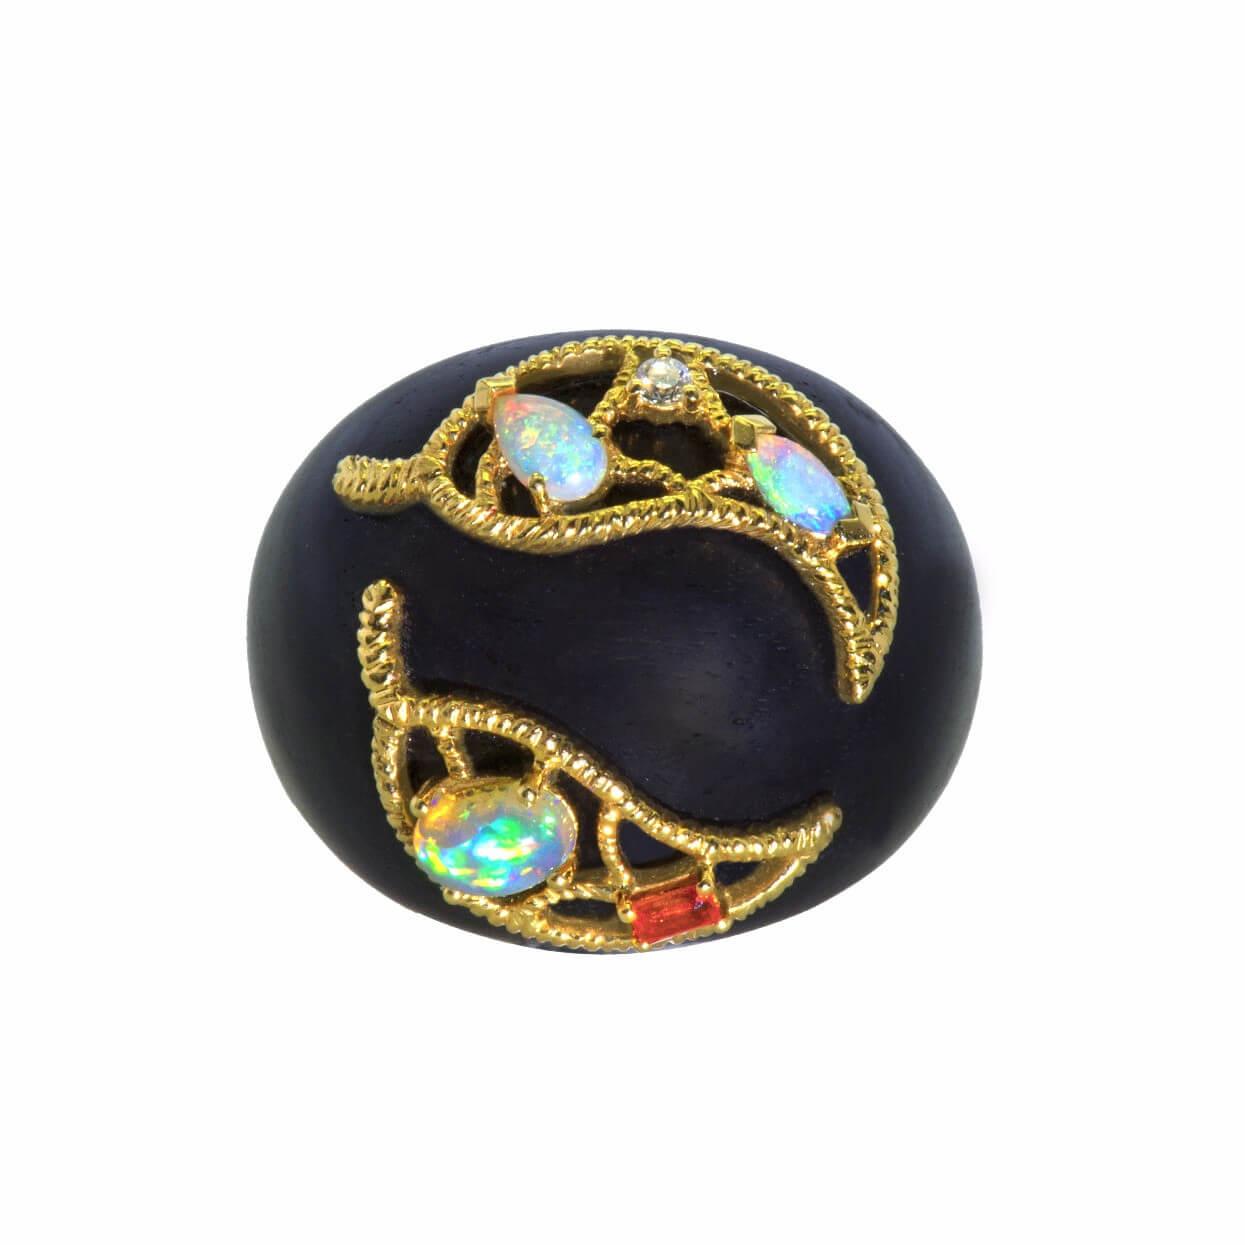 Ebene bague or jaune opale